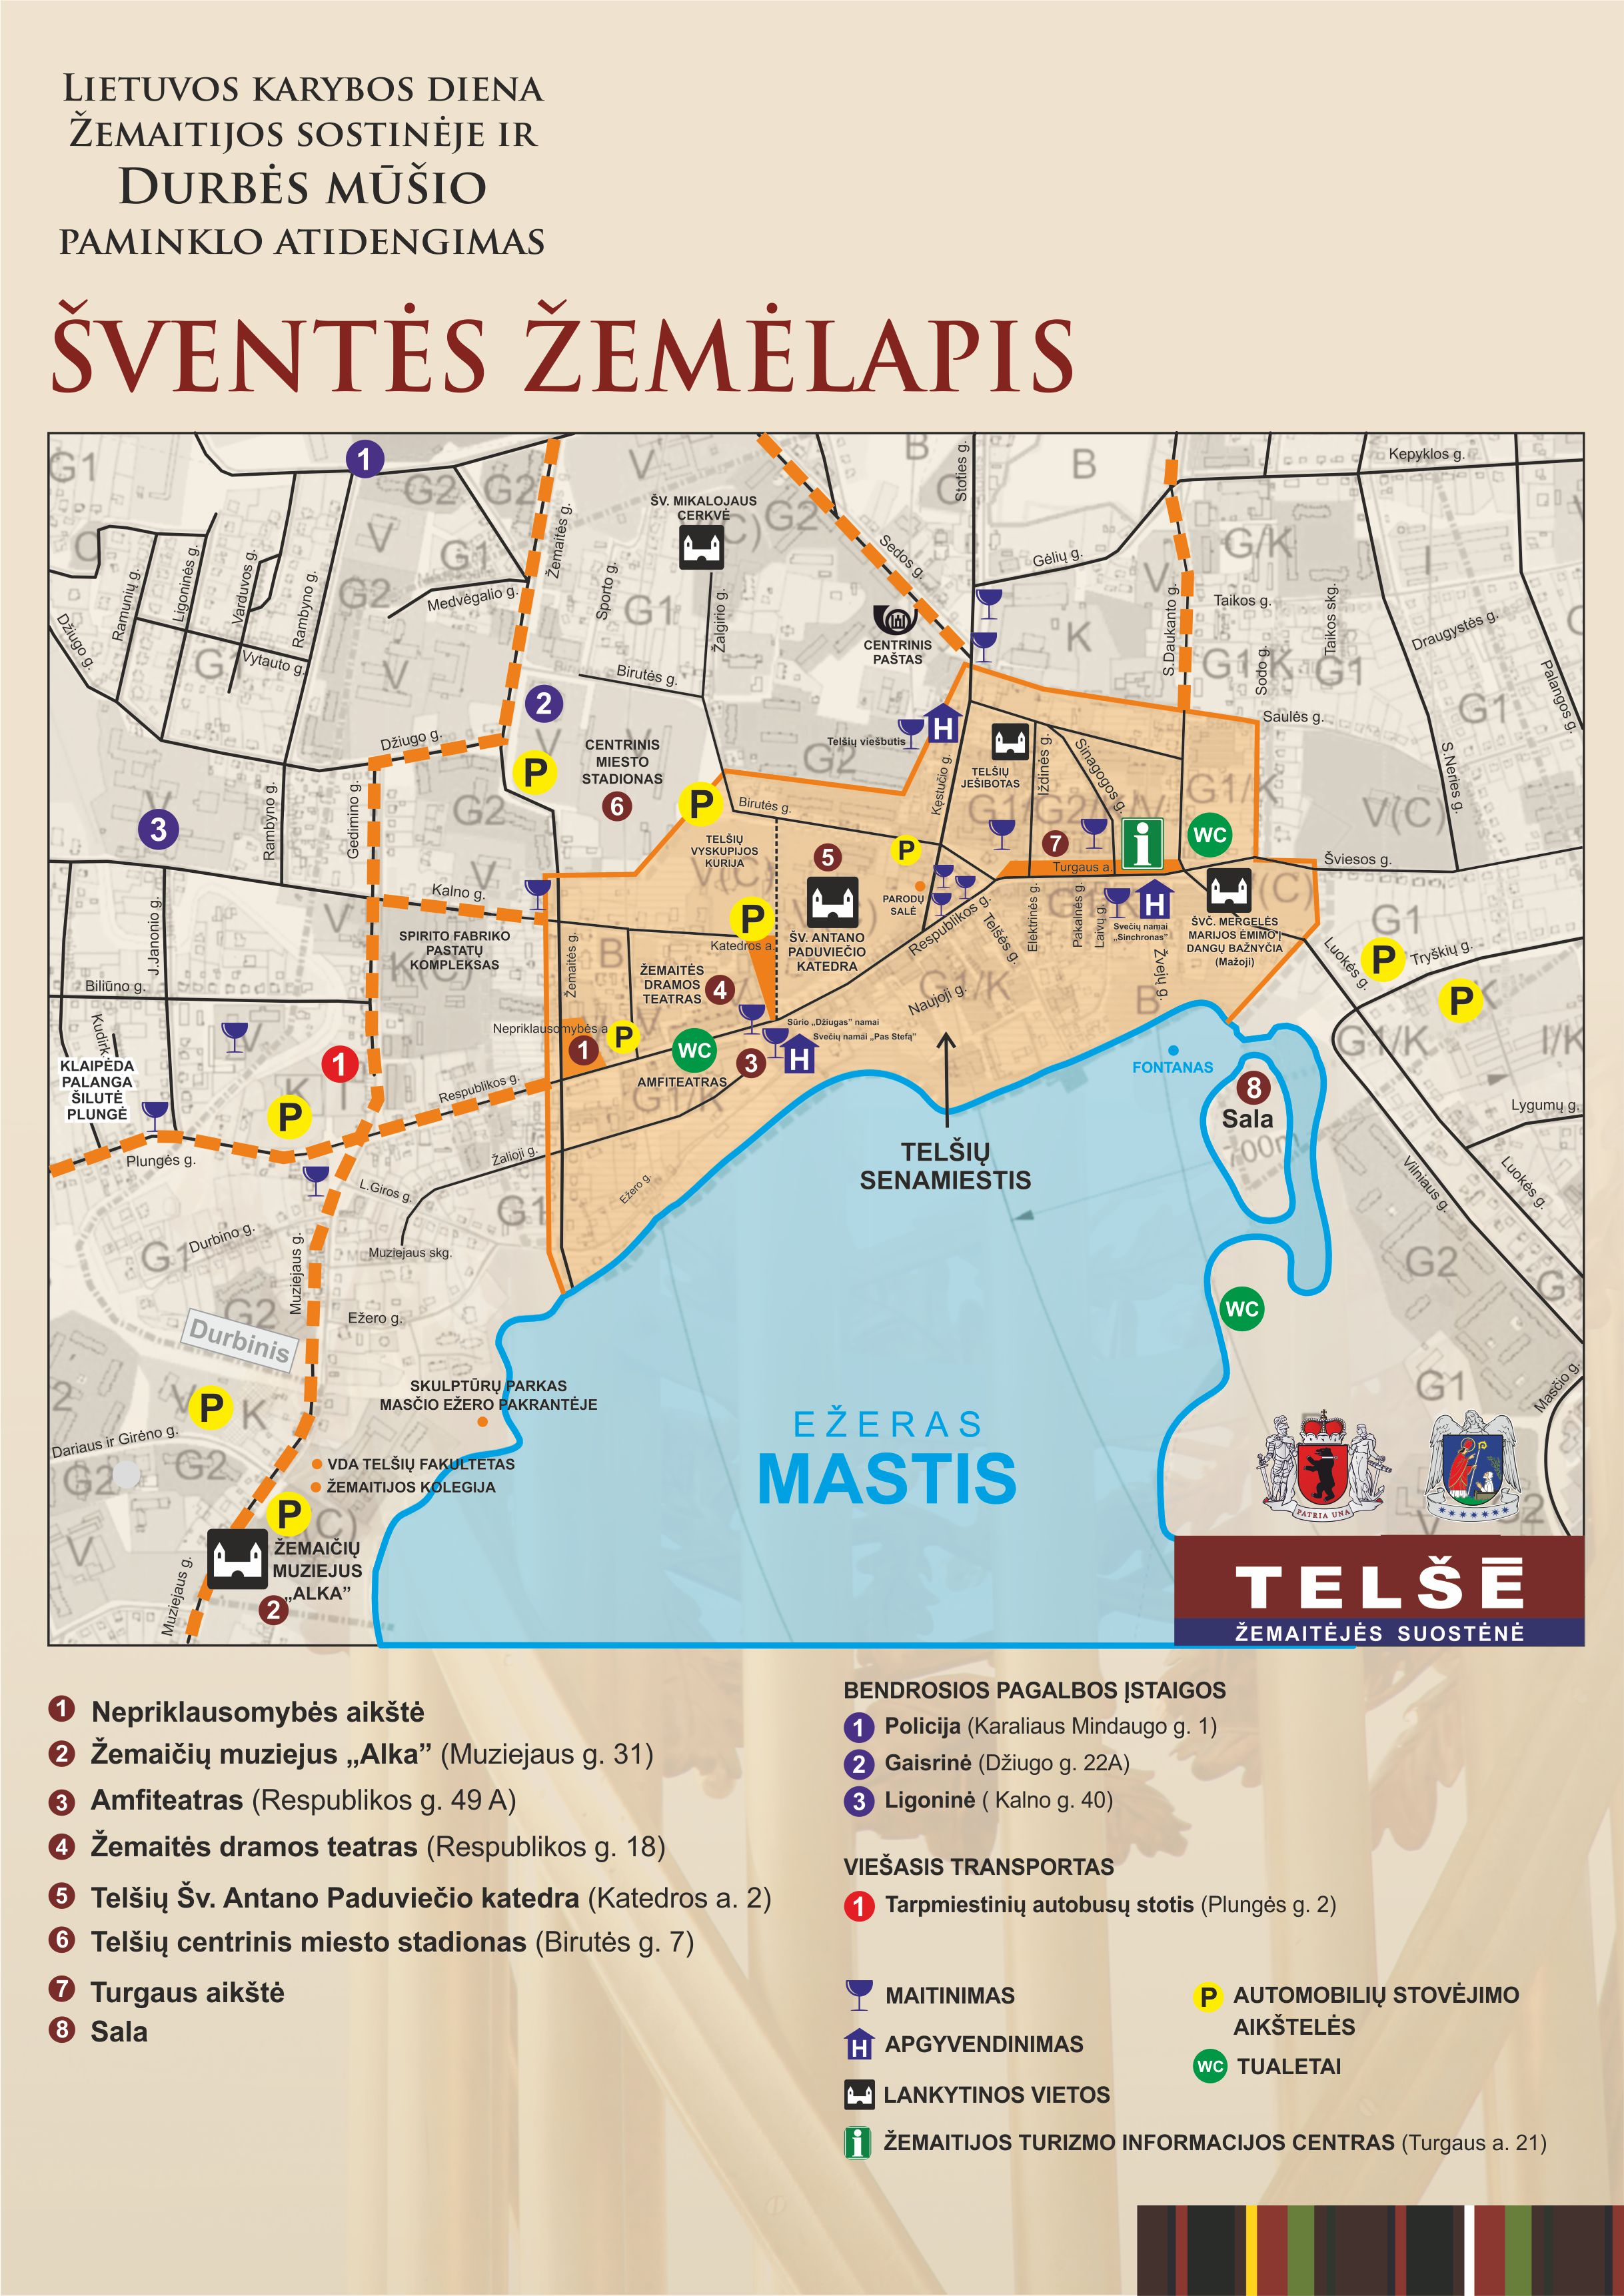 Liepos-23-diena-sventes-zemelapis-kulturossostine2016-lt-nuotr